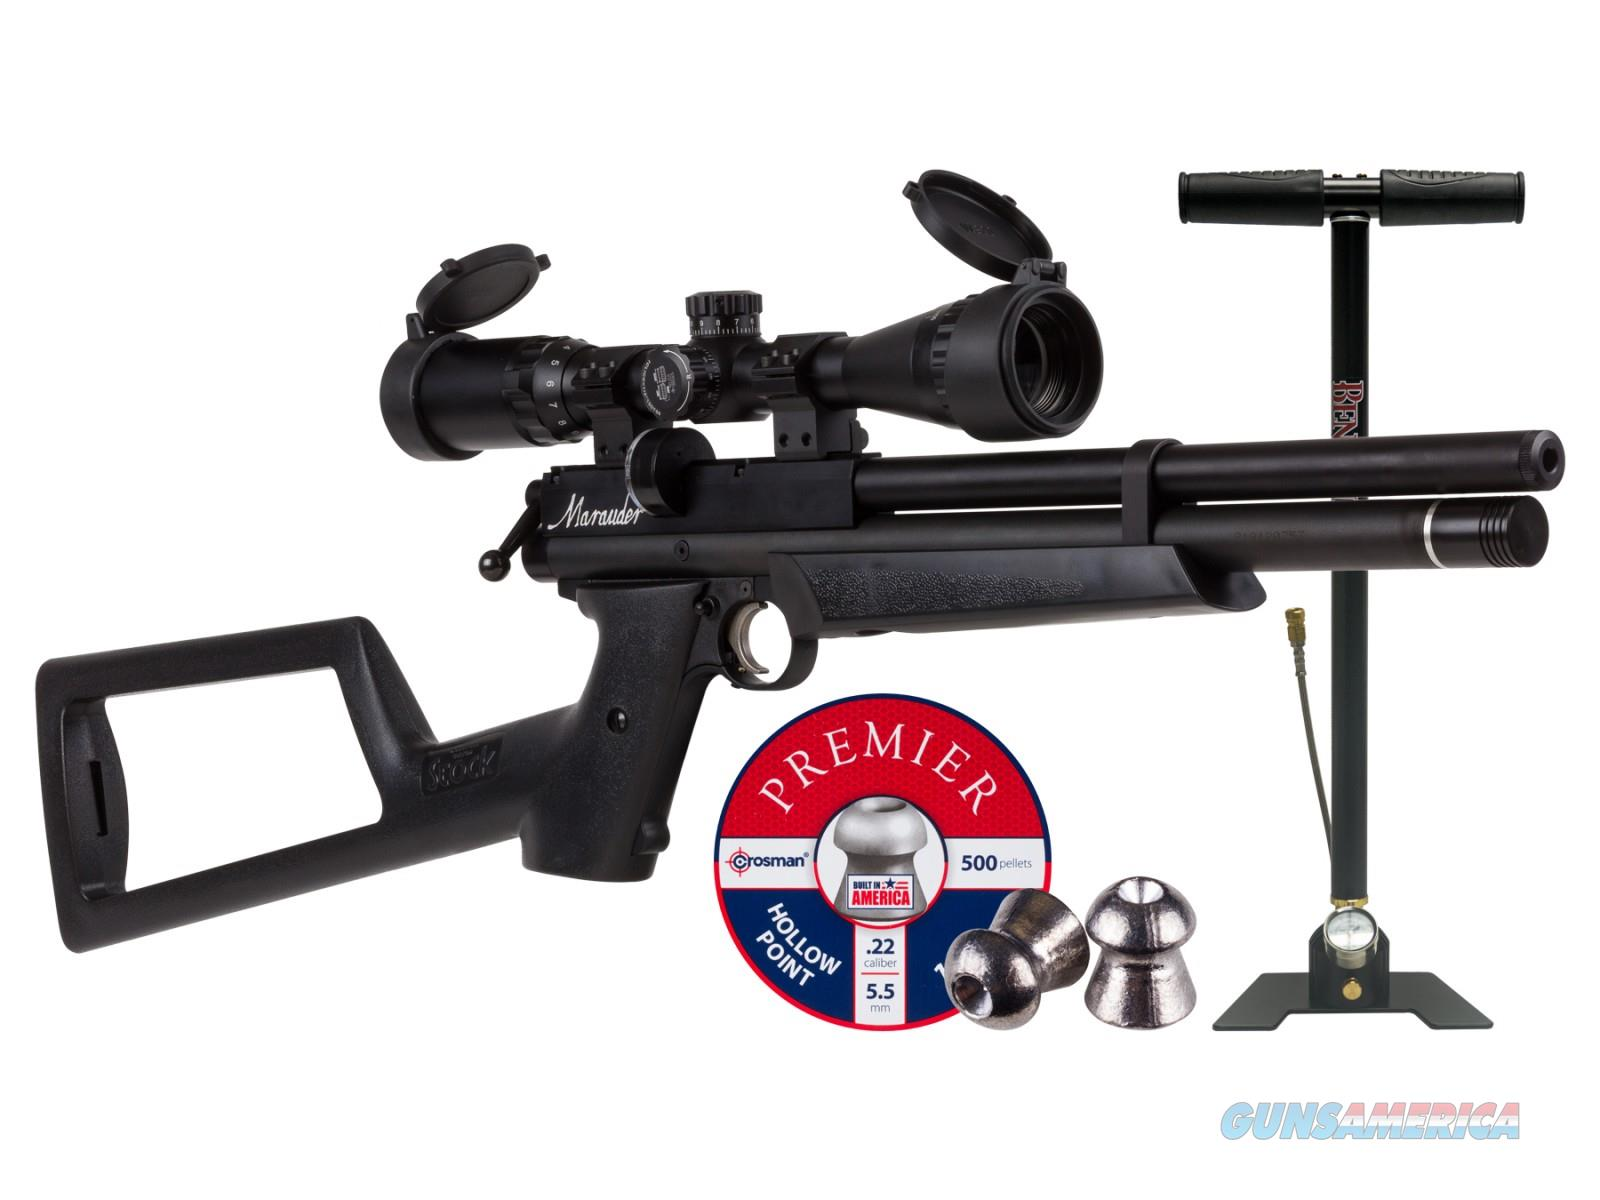 Benjamin Marauder PCP Air Pistol Kit - 0 220 Caliber